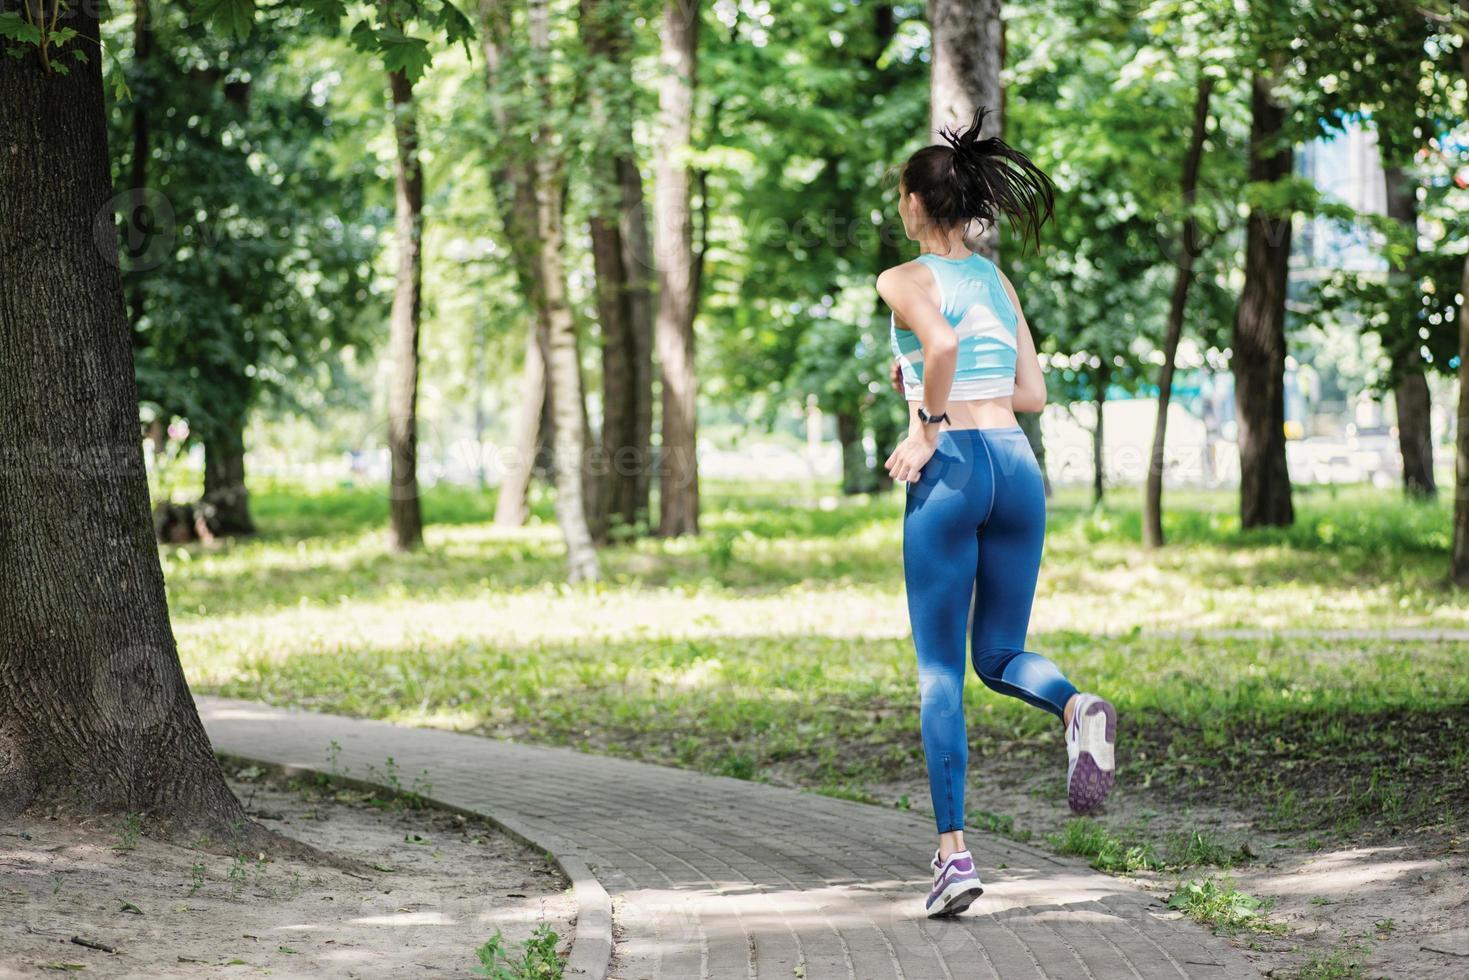 jambes minces. belle femme de remise en forme runner run photo